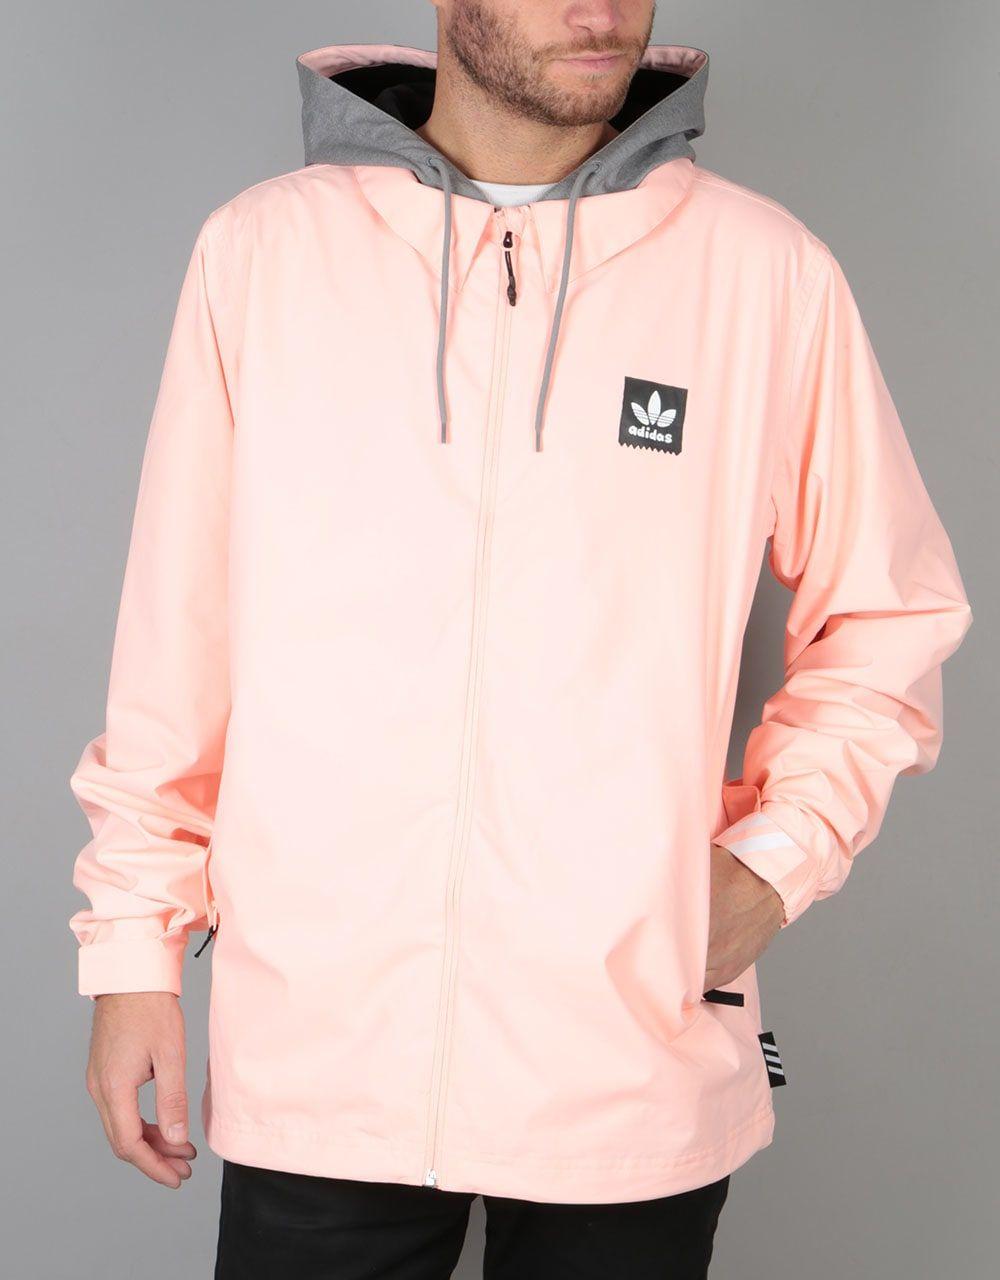 Pantera carpintero virar  Adidas x Gonz Civillian ADV 2018 Snowboard Jacket - Haze Coral/Heather    Snowboard jacket, Skateboard clothes, Jackets